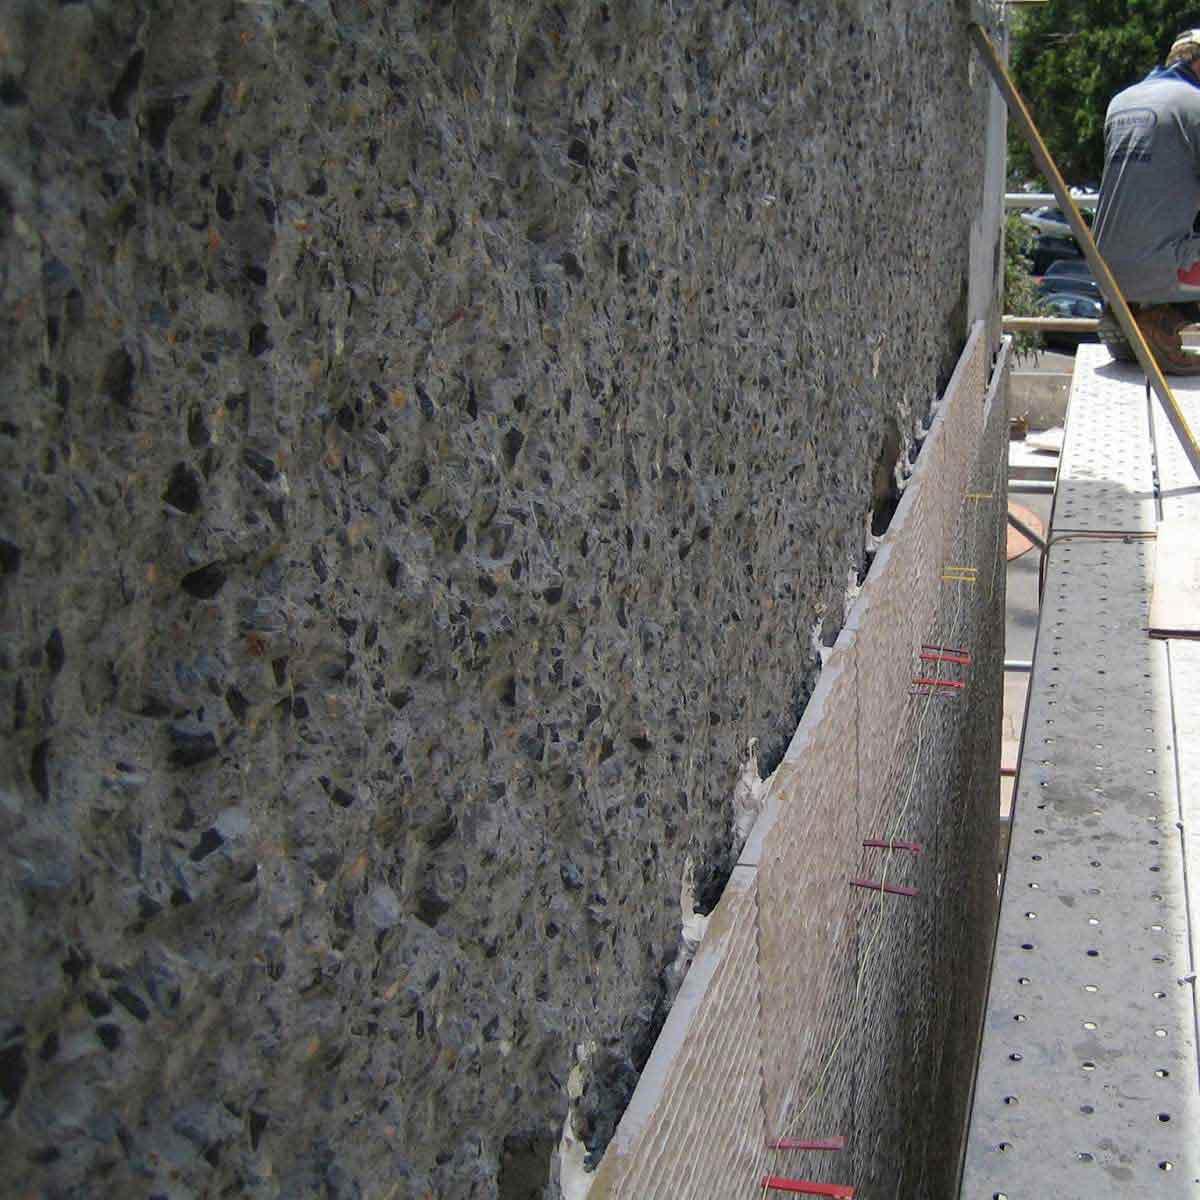 S-310AB-NC-10 Latapoxy 310 Stone Adhesive